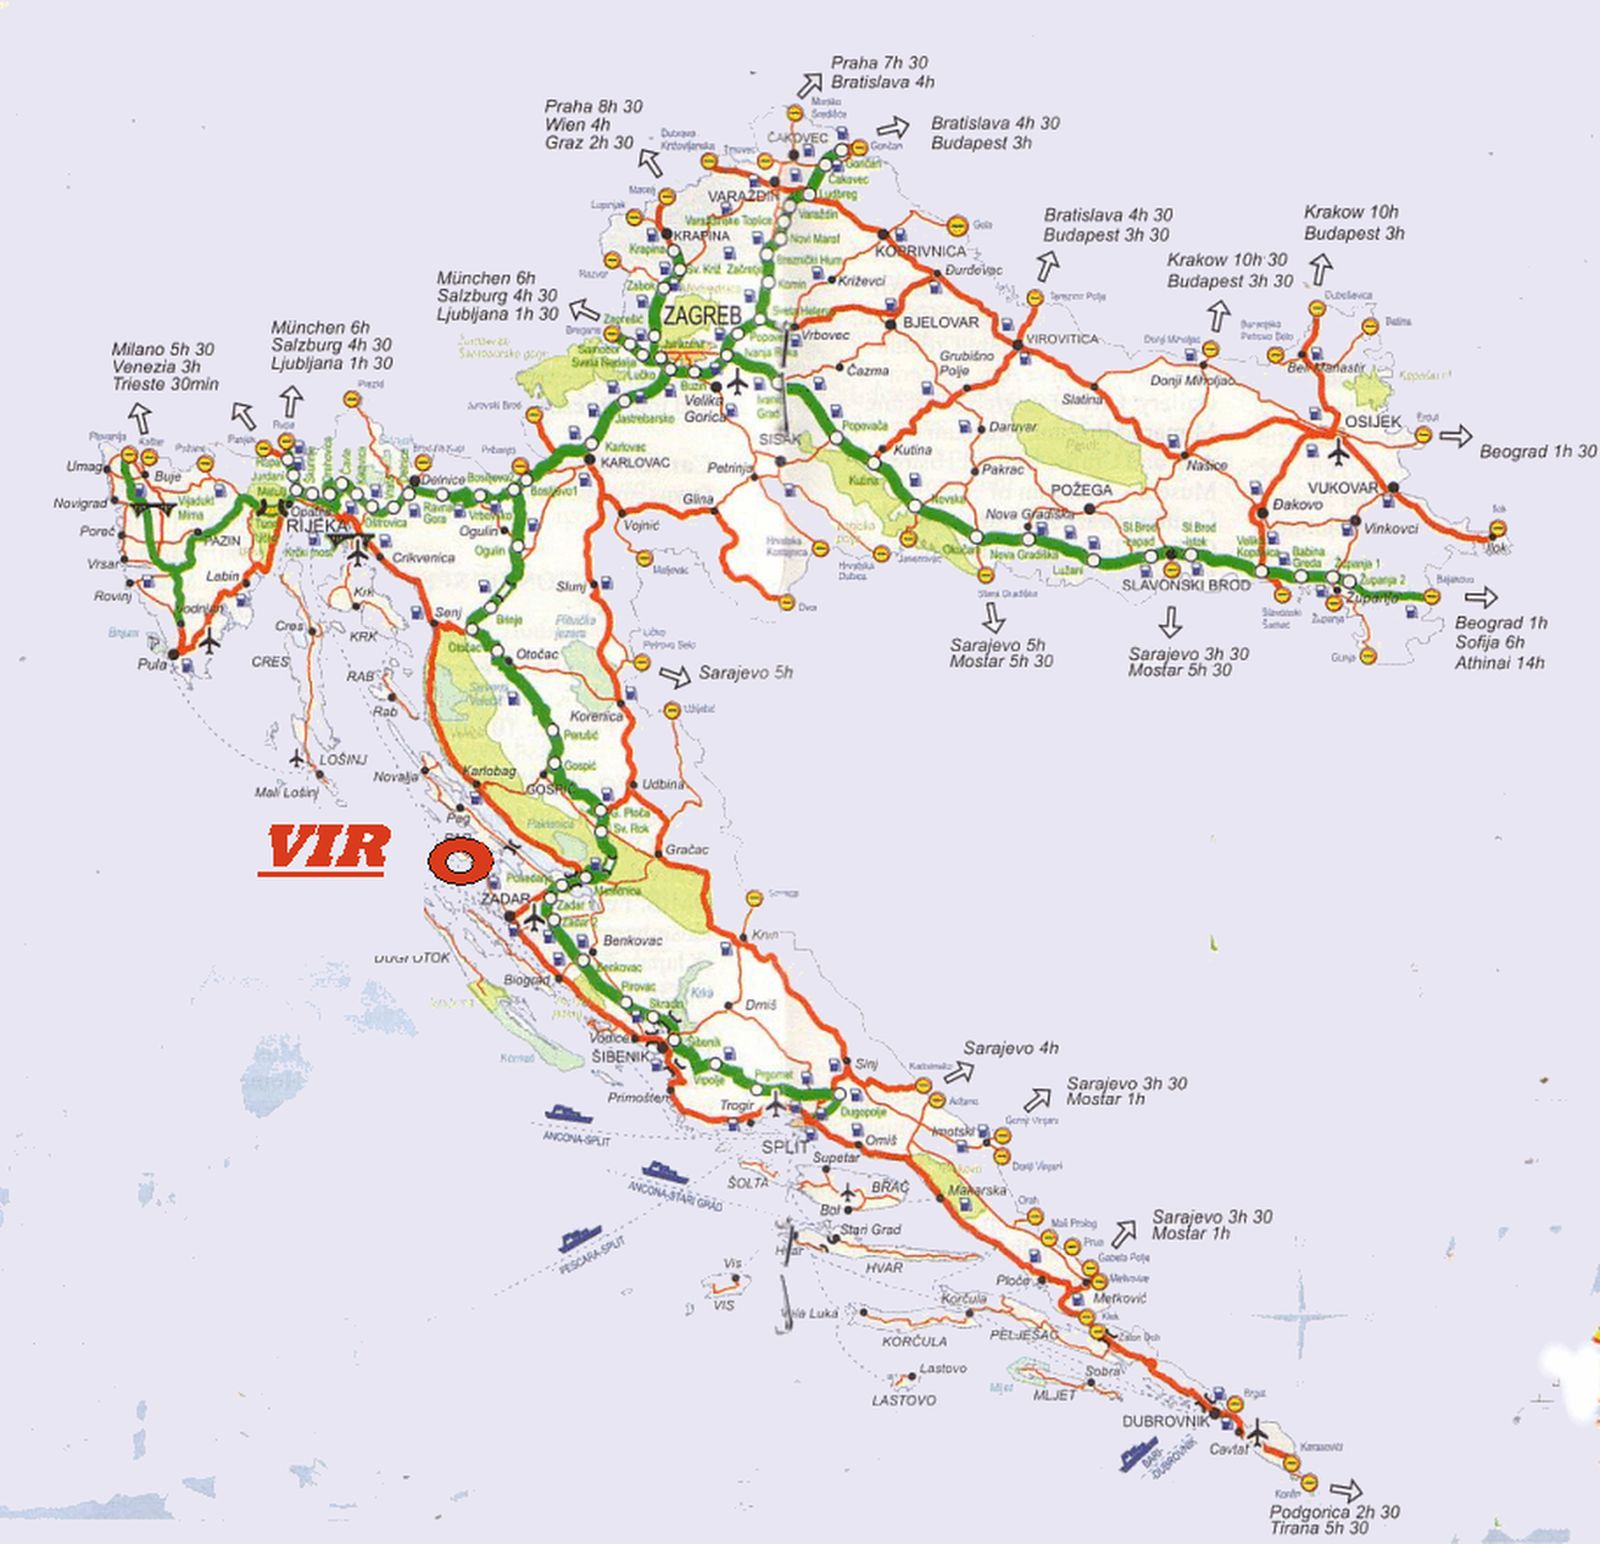 vir sziget térkép Térképek vir sziget térkép